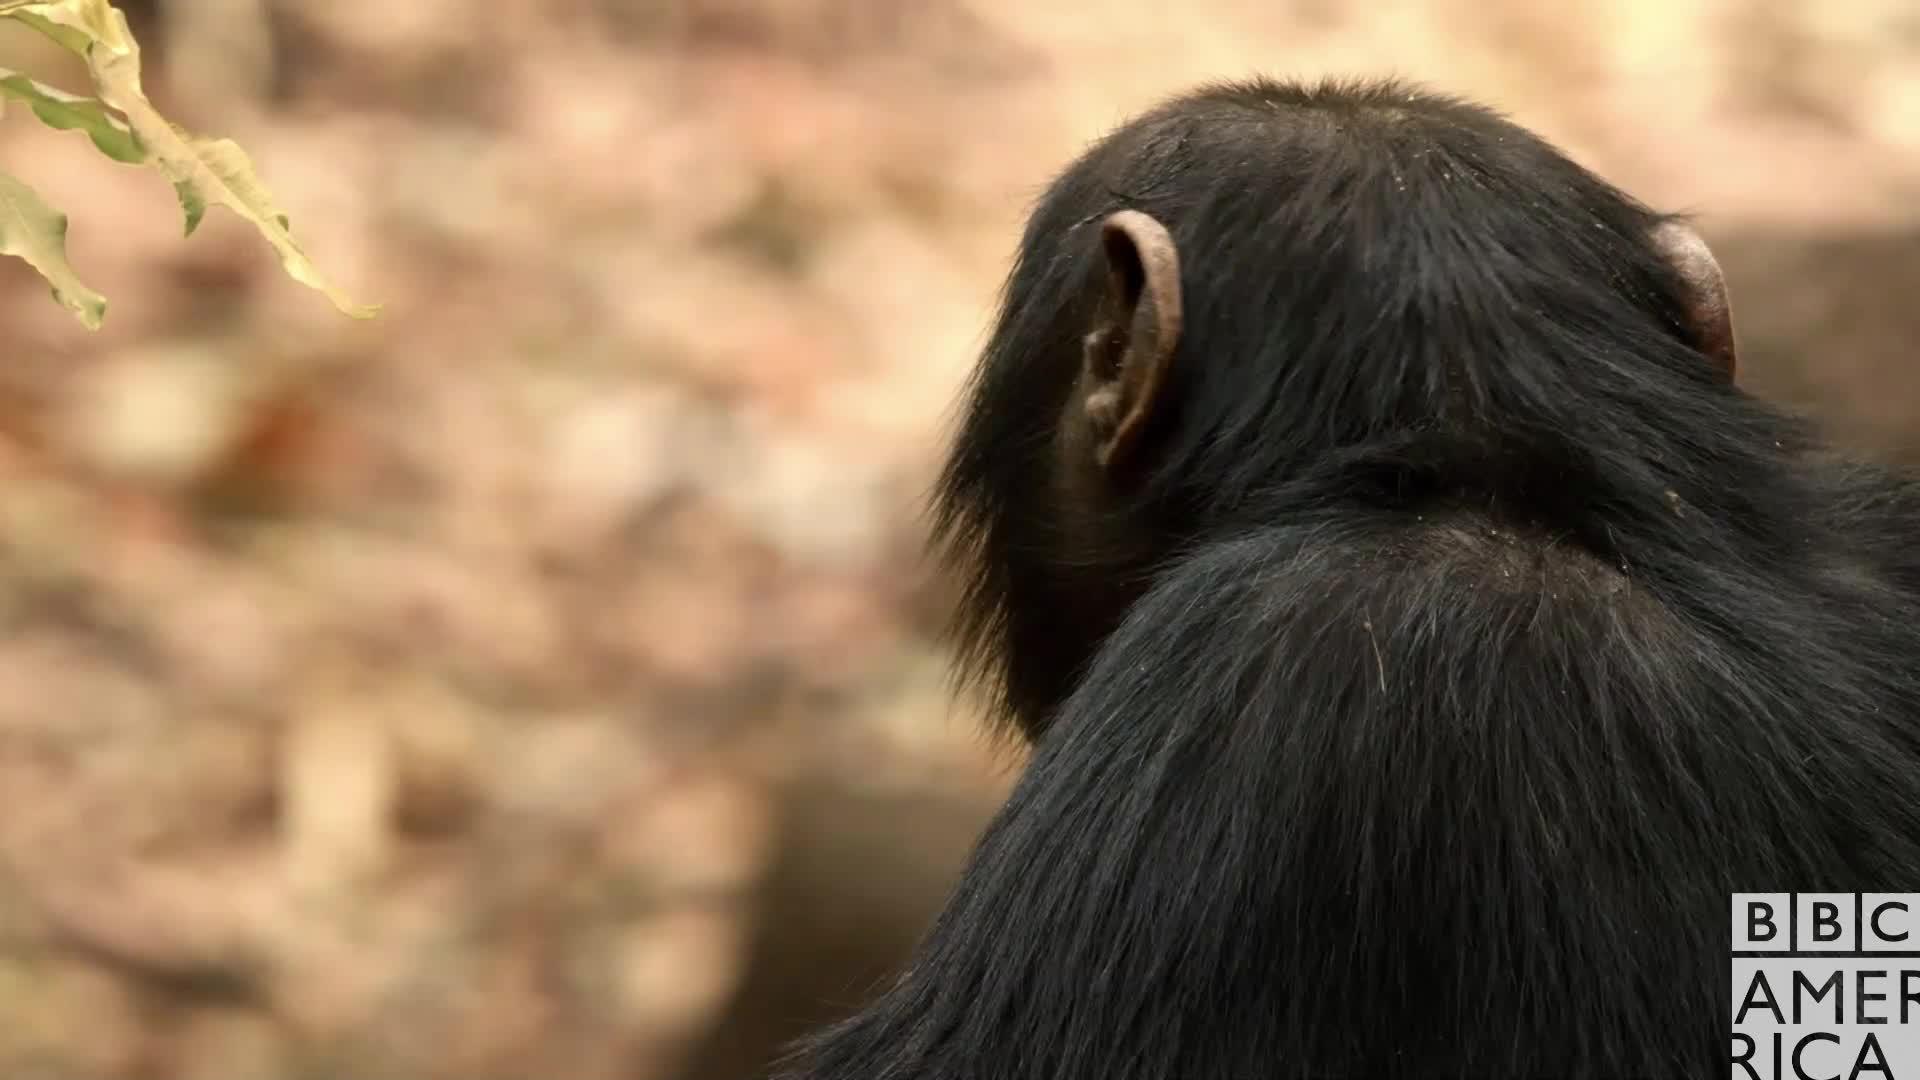 animal, animals, bbc america, bbc america dynasties, bbc america: dynasties, chimp, chimpanzee, chimpanzees, chimps, dynasties, Dynasties Chimp Smile GIFs